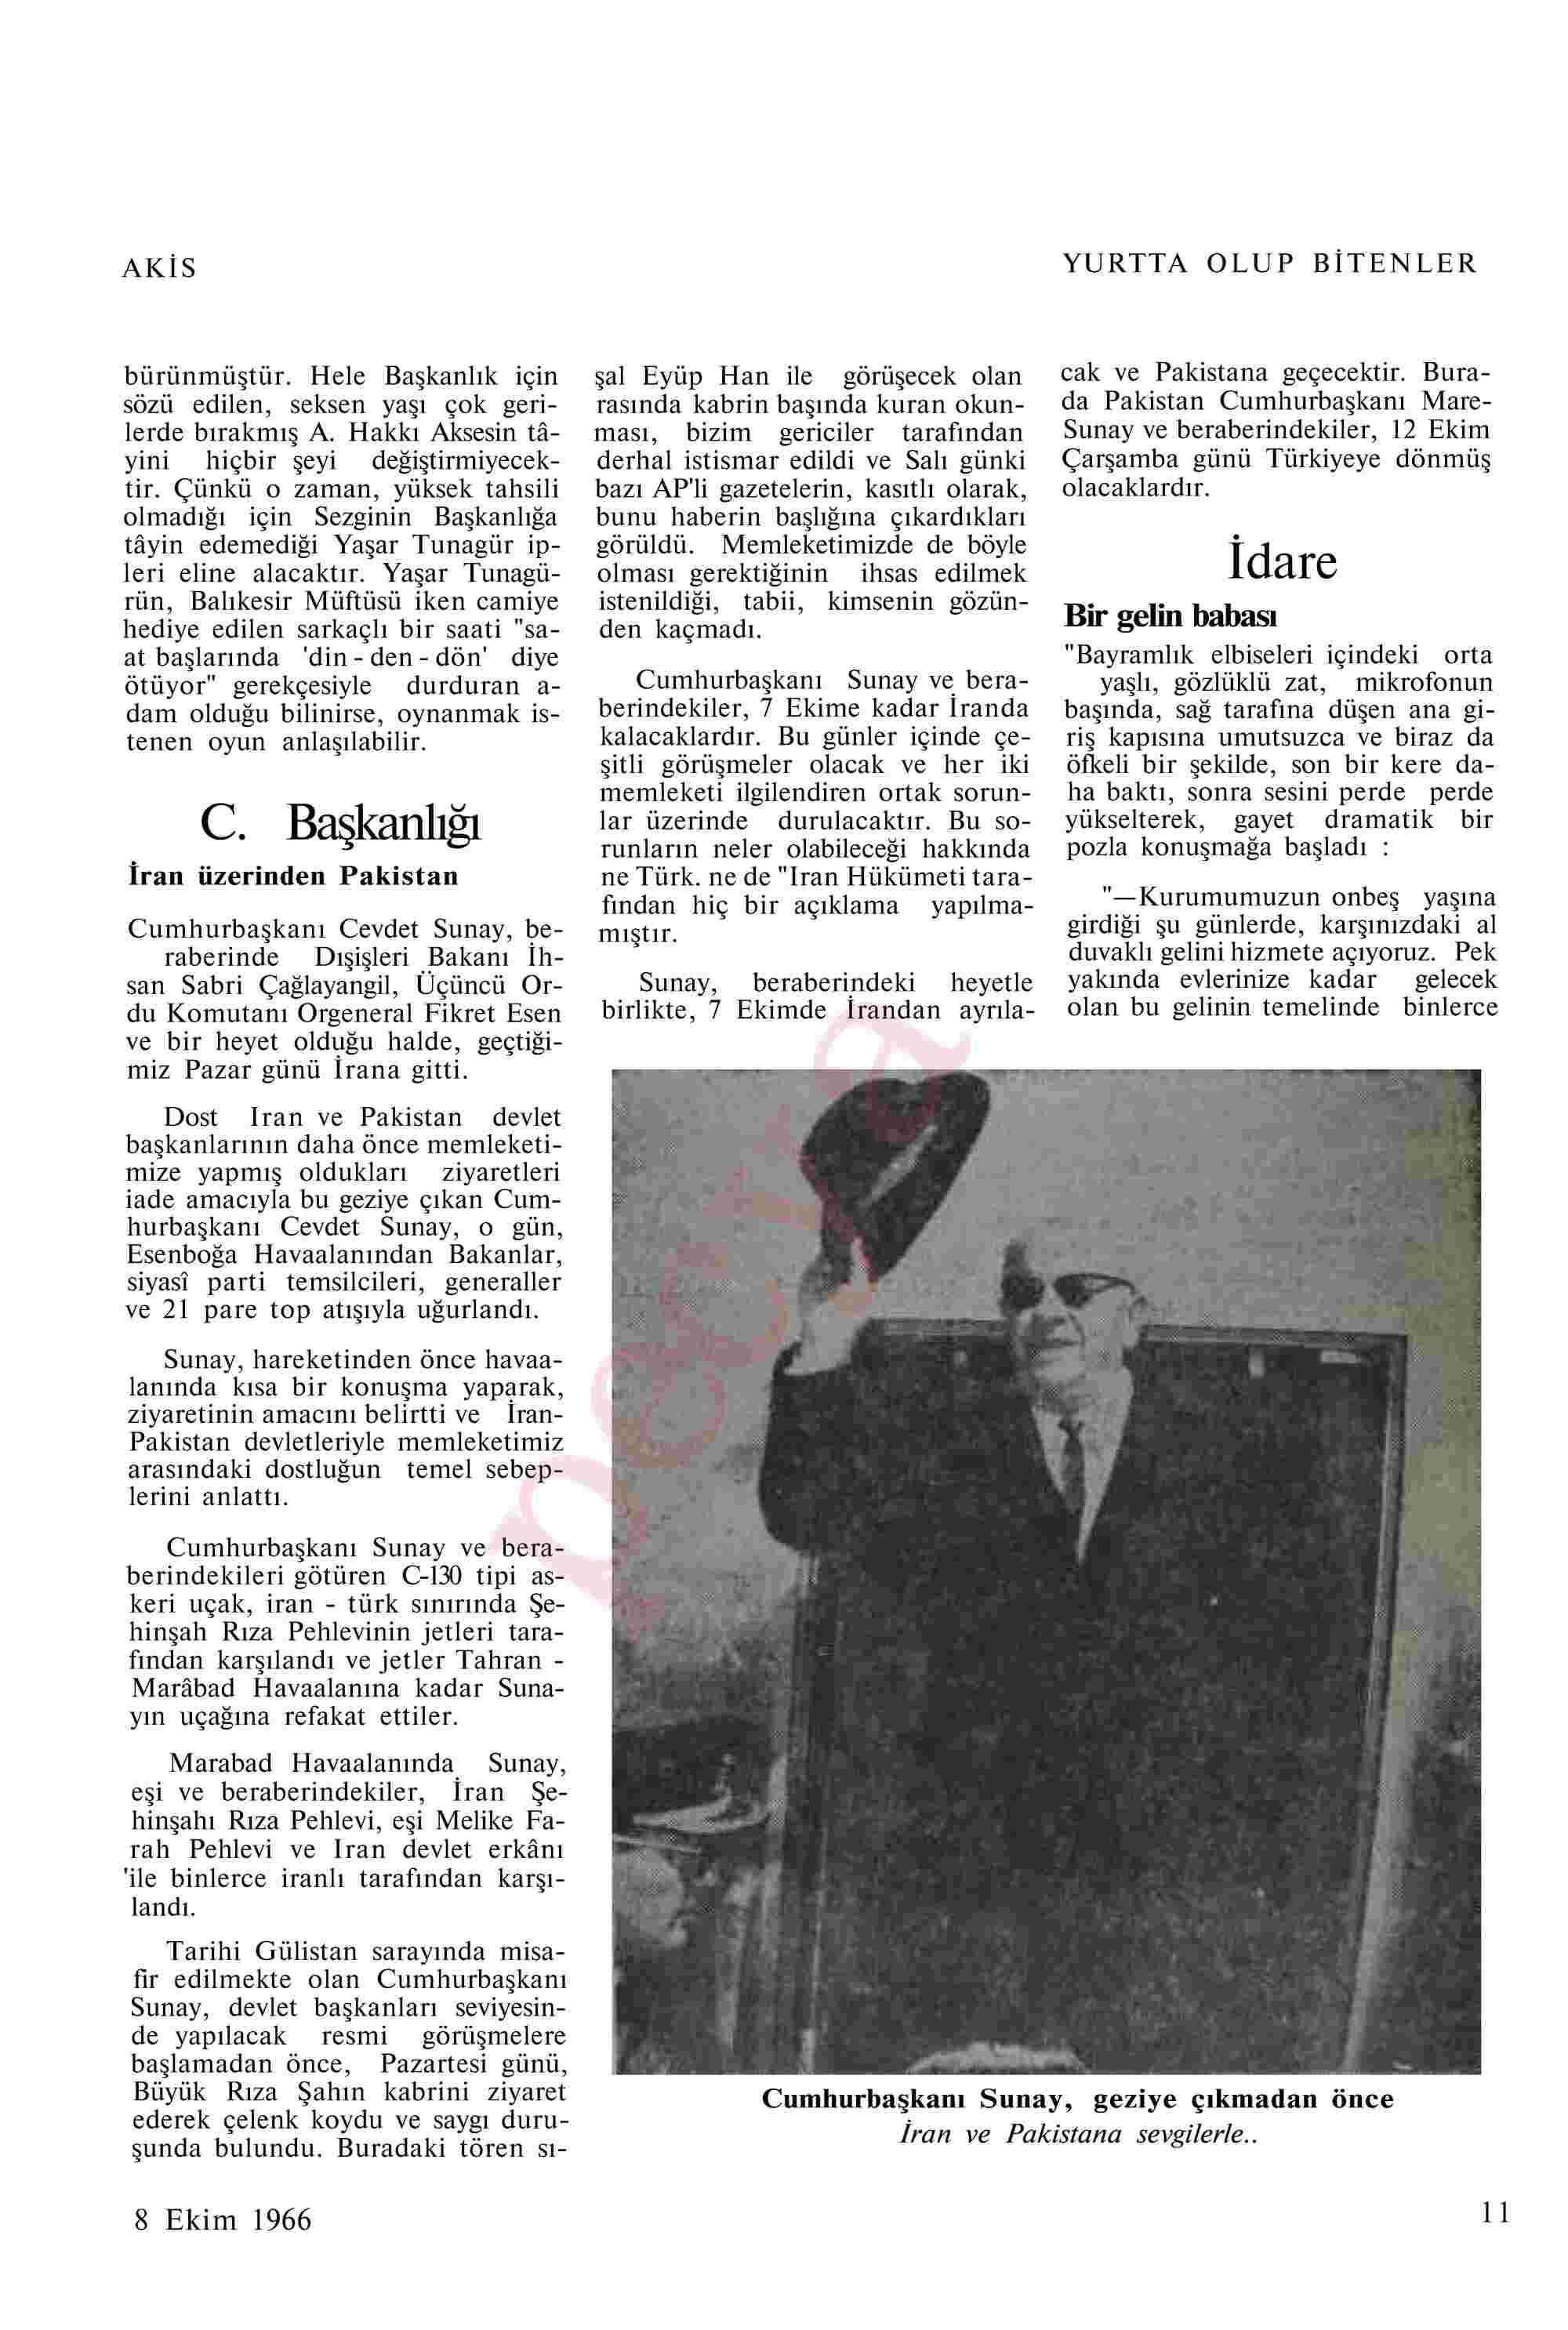 8 Ekim 1966 Tarihli Akis Dergisi Sayfa 11